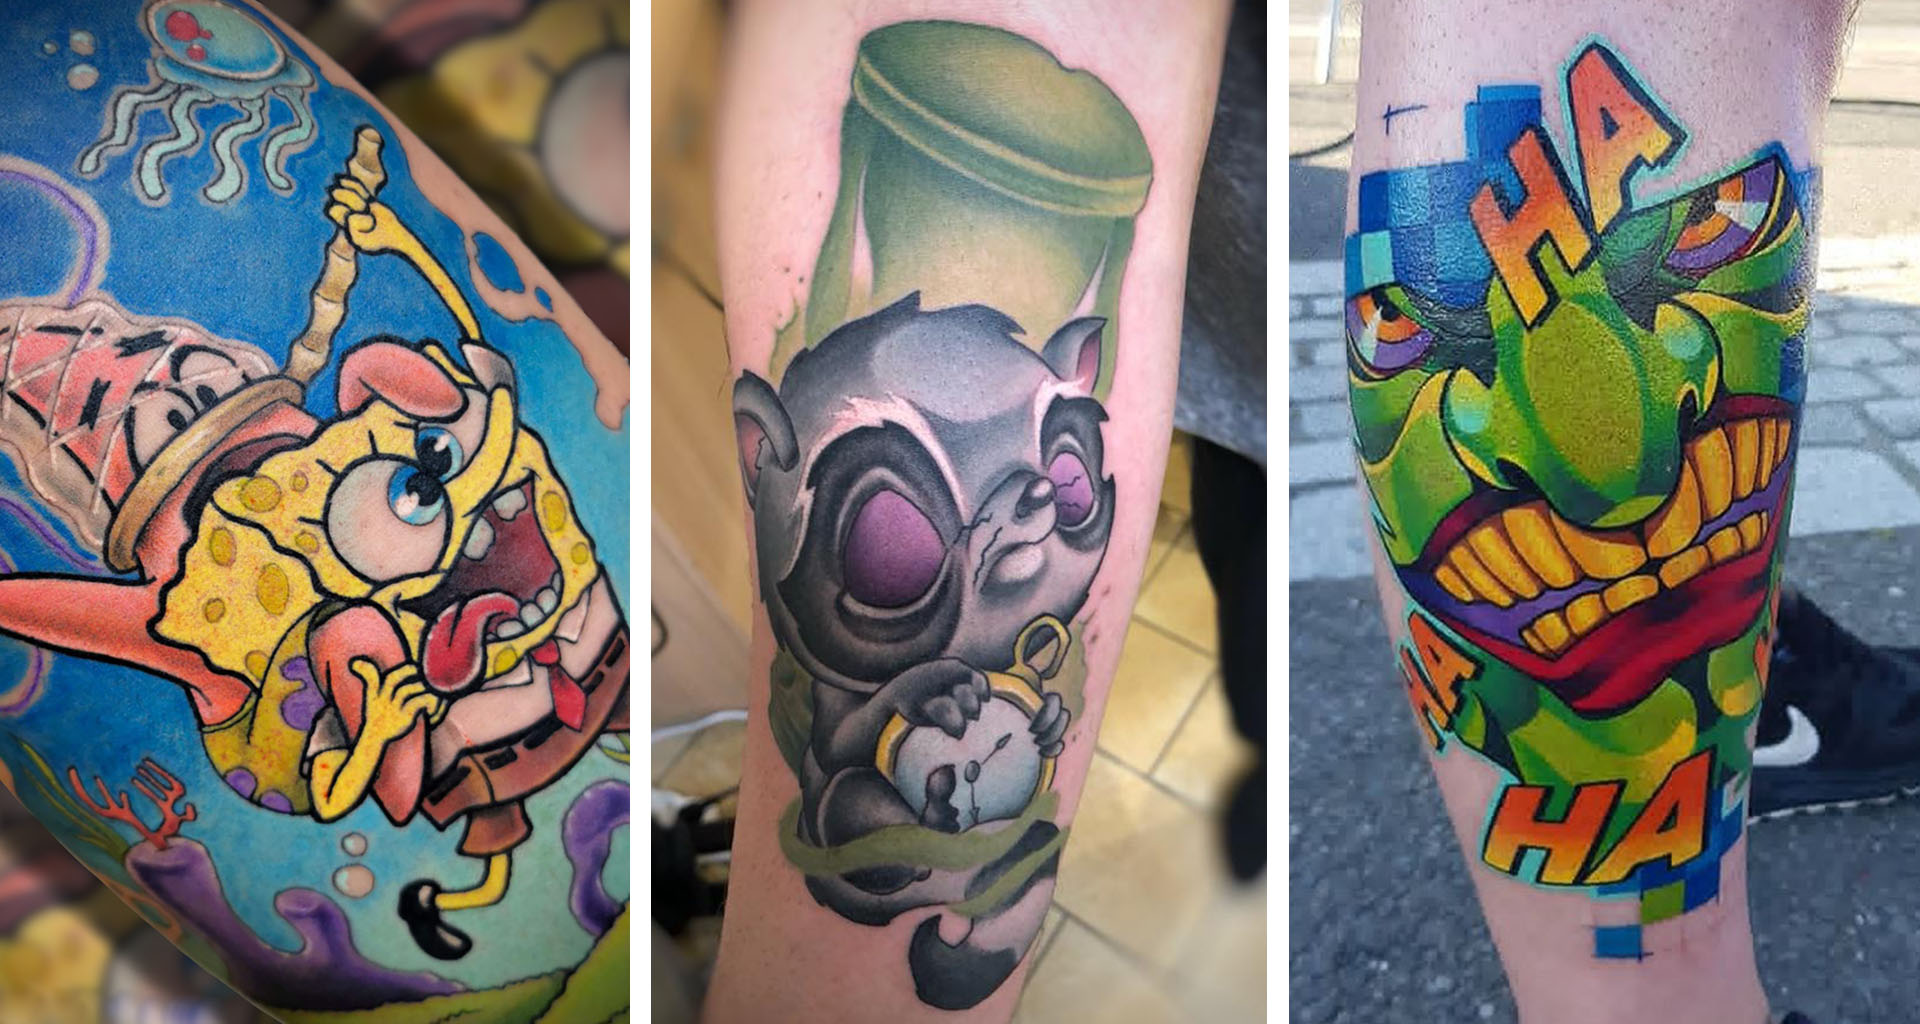 blog-article-les-differents-styles-du-tatouage-daf-vador-greg-hide-aurel-rondl